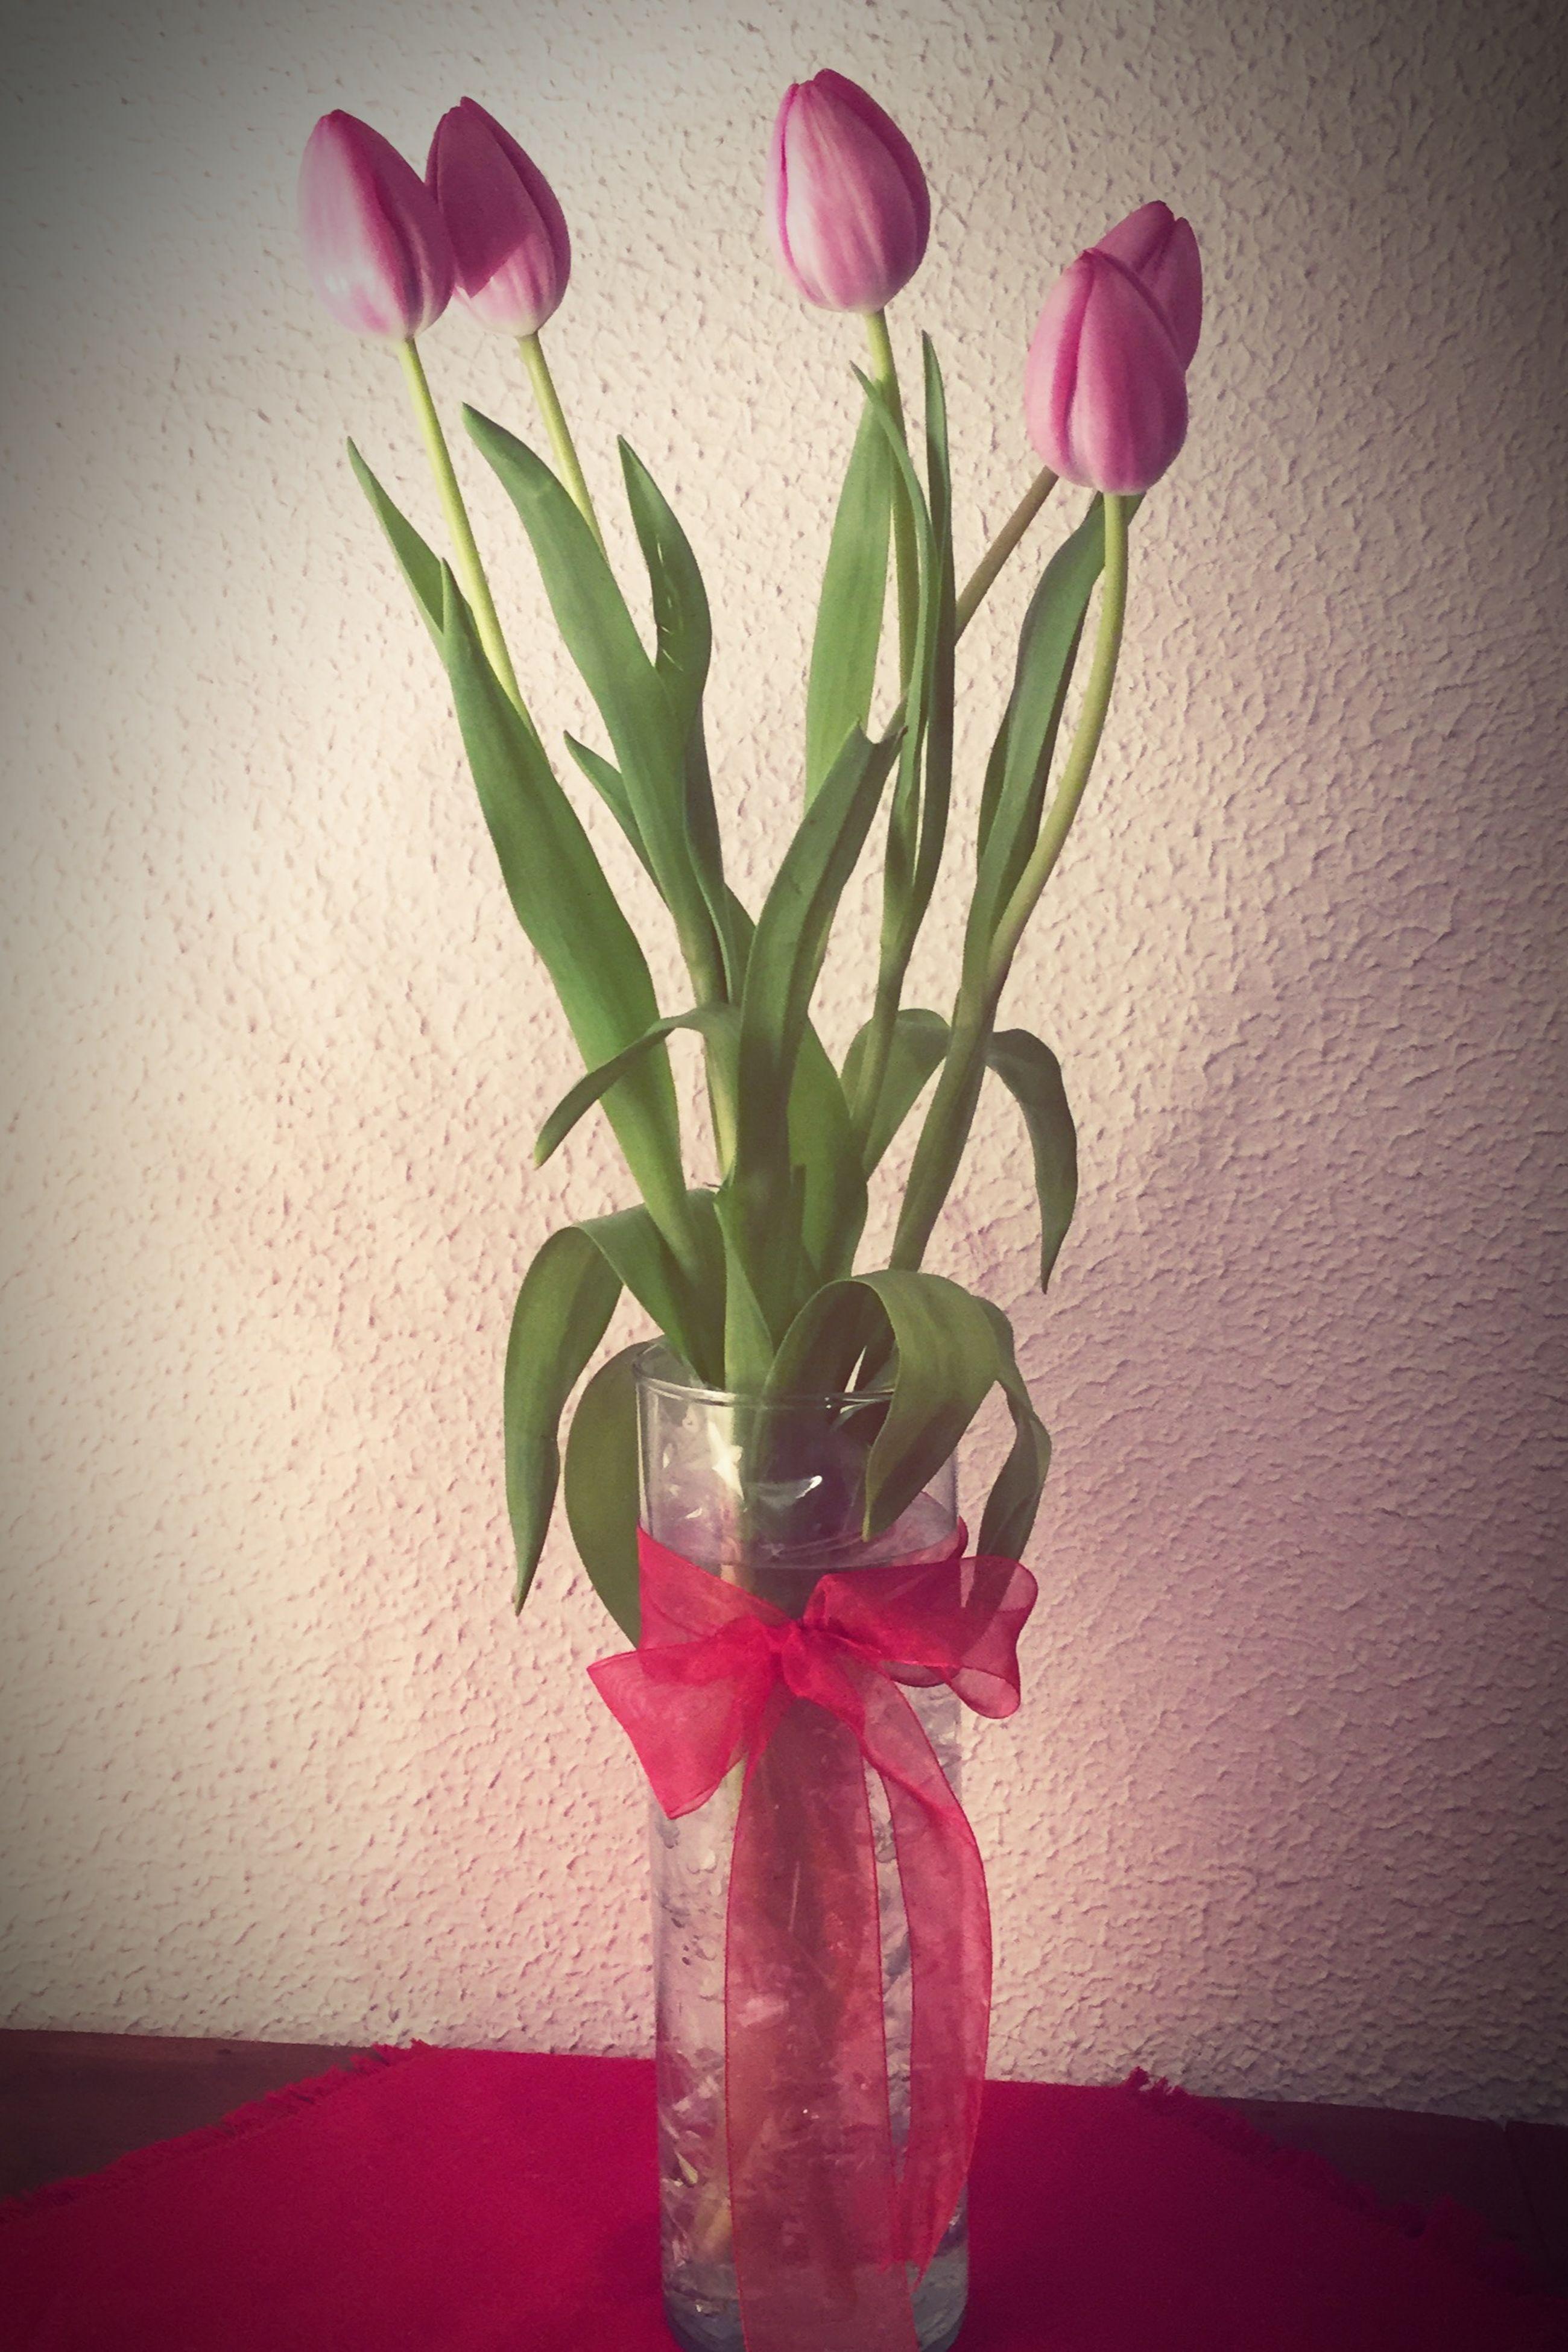 flower, petal, fragility, freshness, vase, indoors, flower head, growth, wall - building feature, plant, stem, rose - flower, leaf, beauty in nature, close-up, flower arrangement, home interior, nature, pink color, decoration